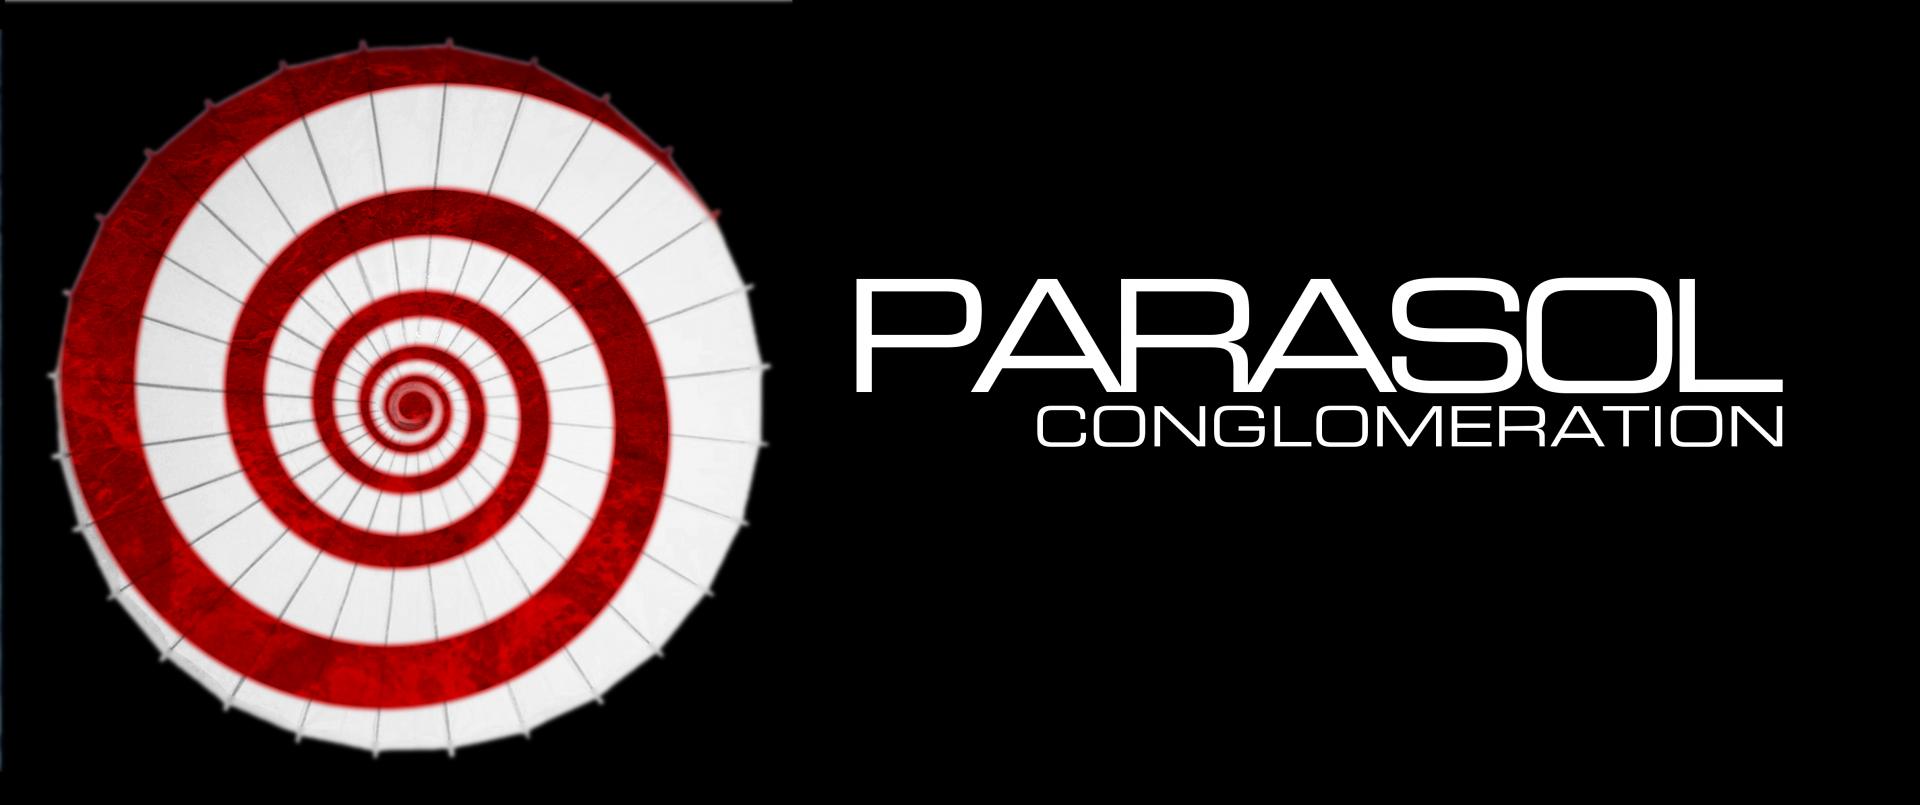 Parasol black